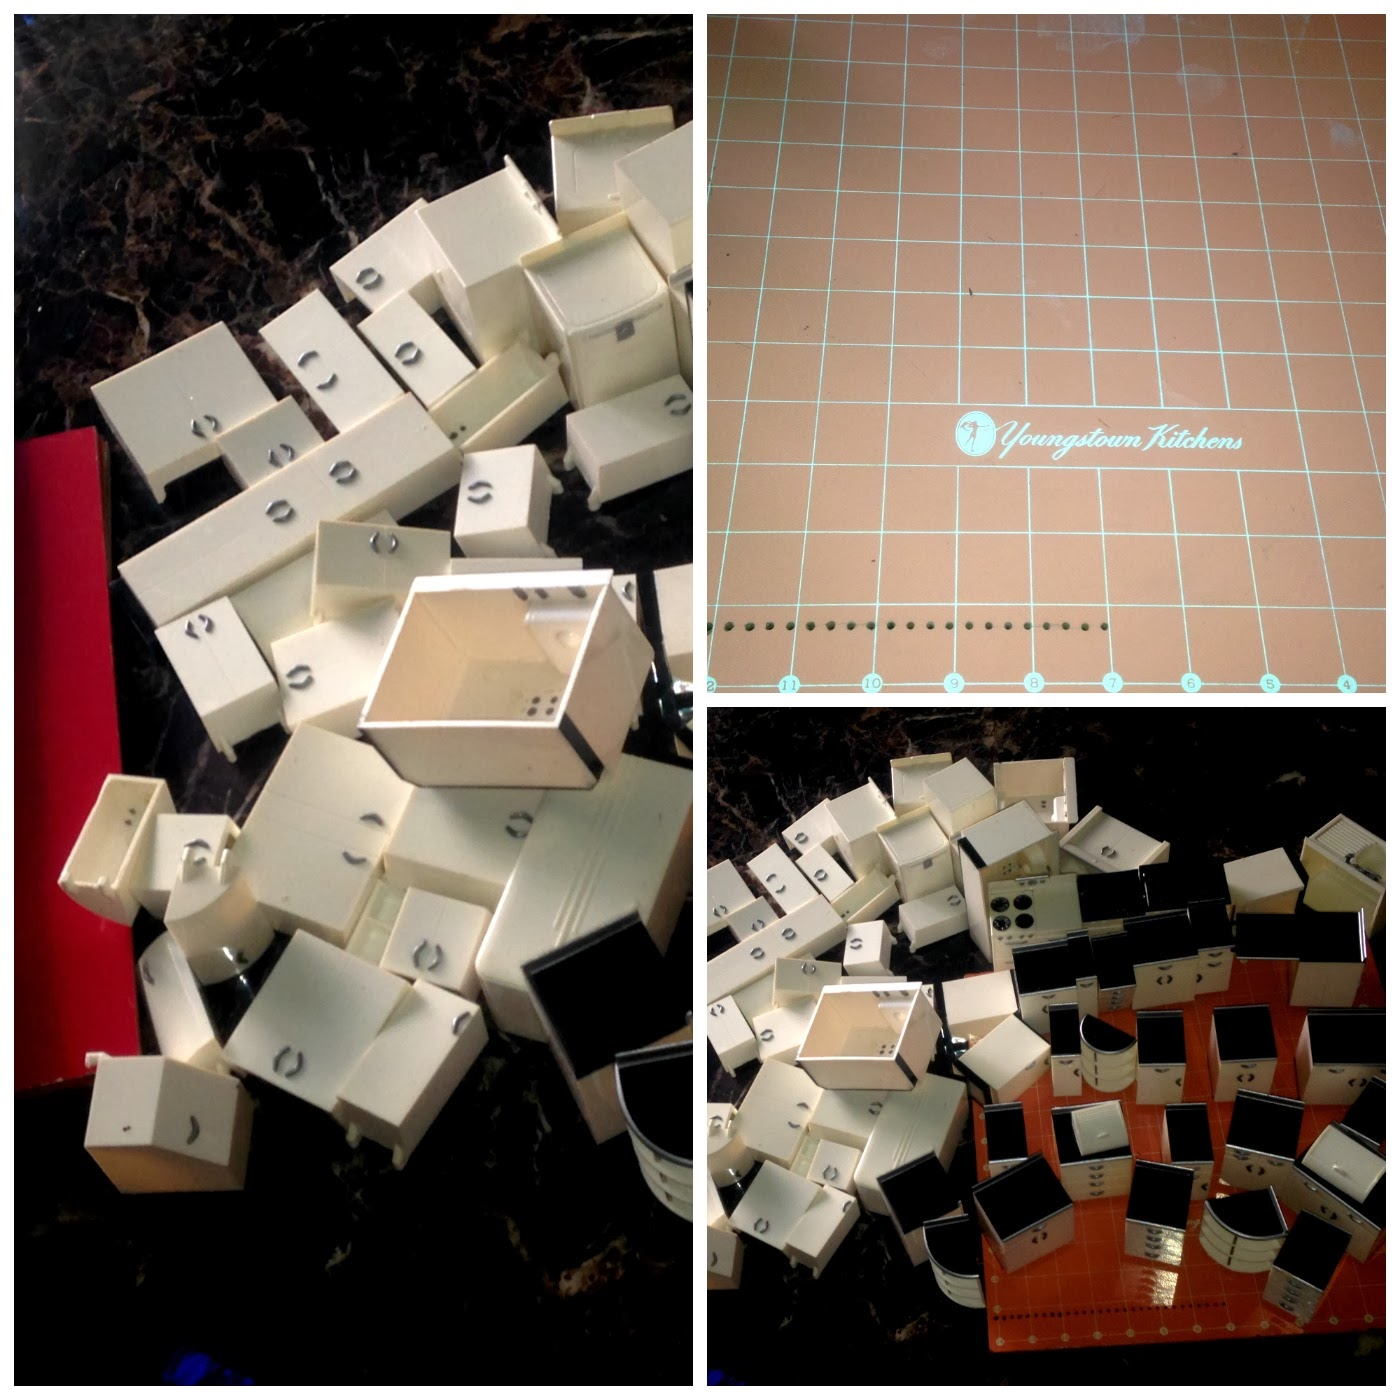 Youngstown Kitchen Salesman Set Plastic Miniatures